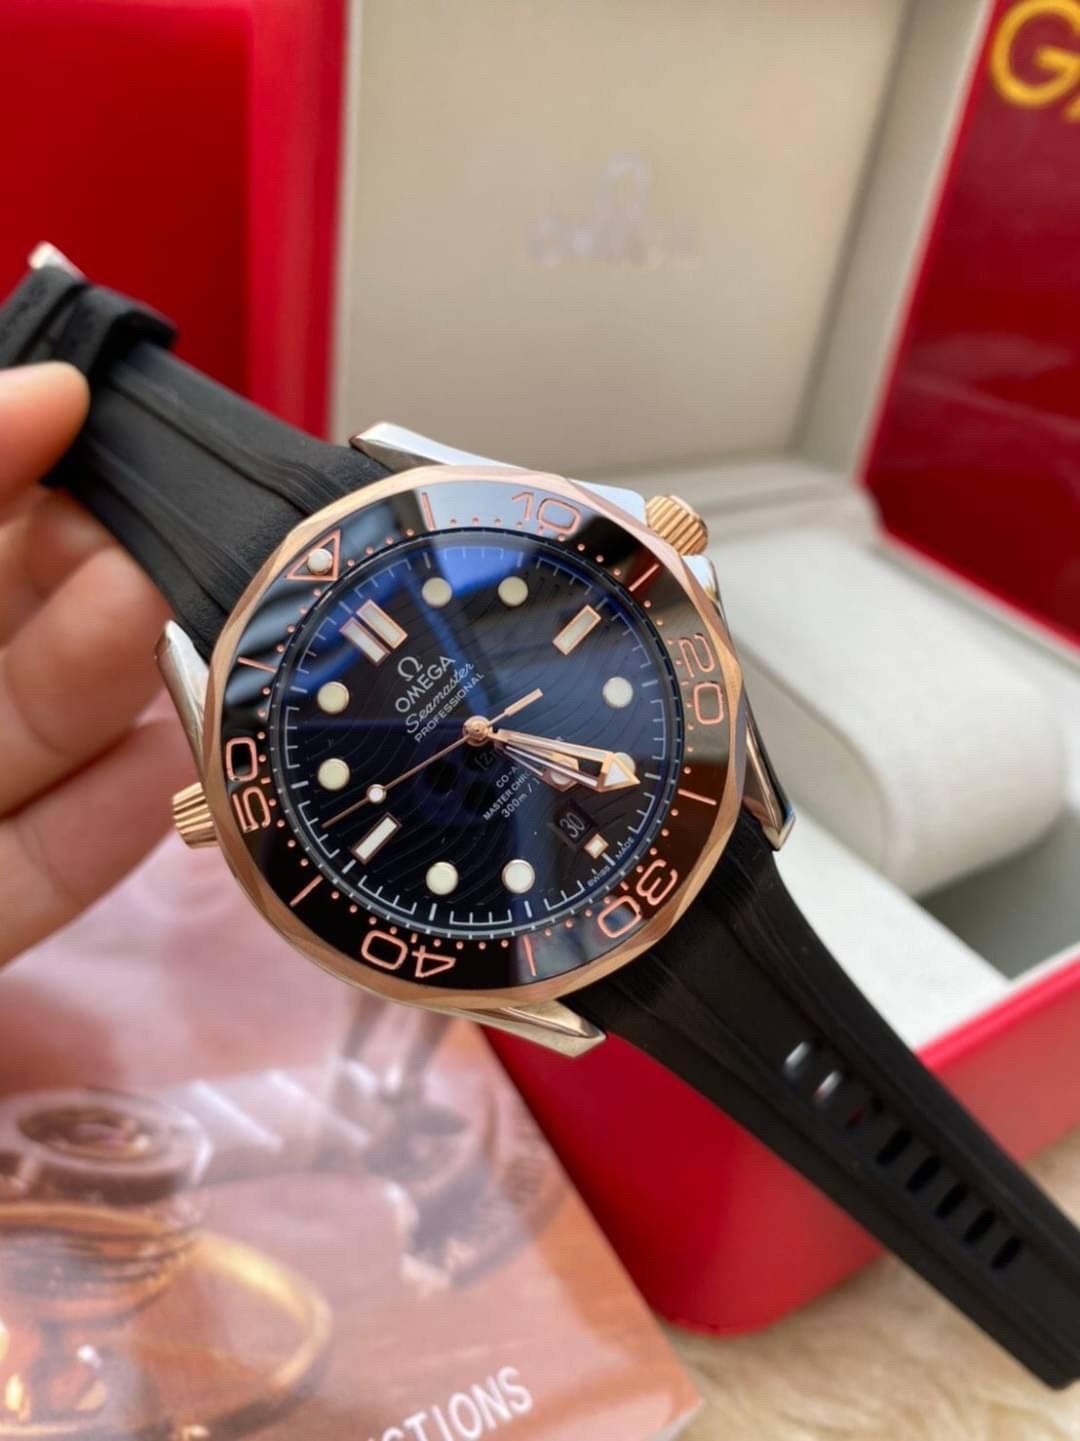 Omega Seamaster Diver 300M 42mm Black Dial Rose Gold Case Rubber Strap, mirror